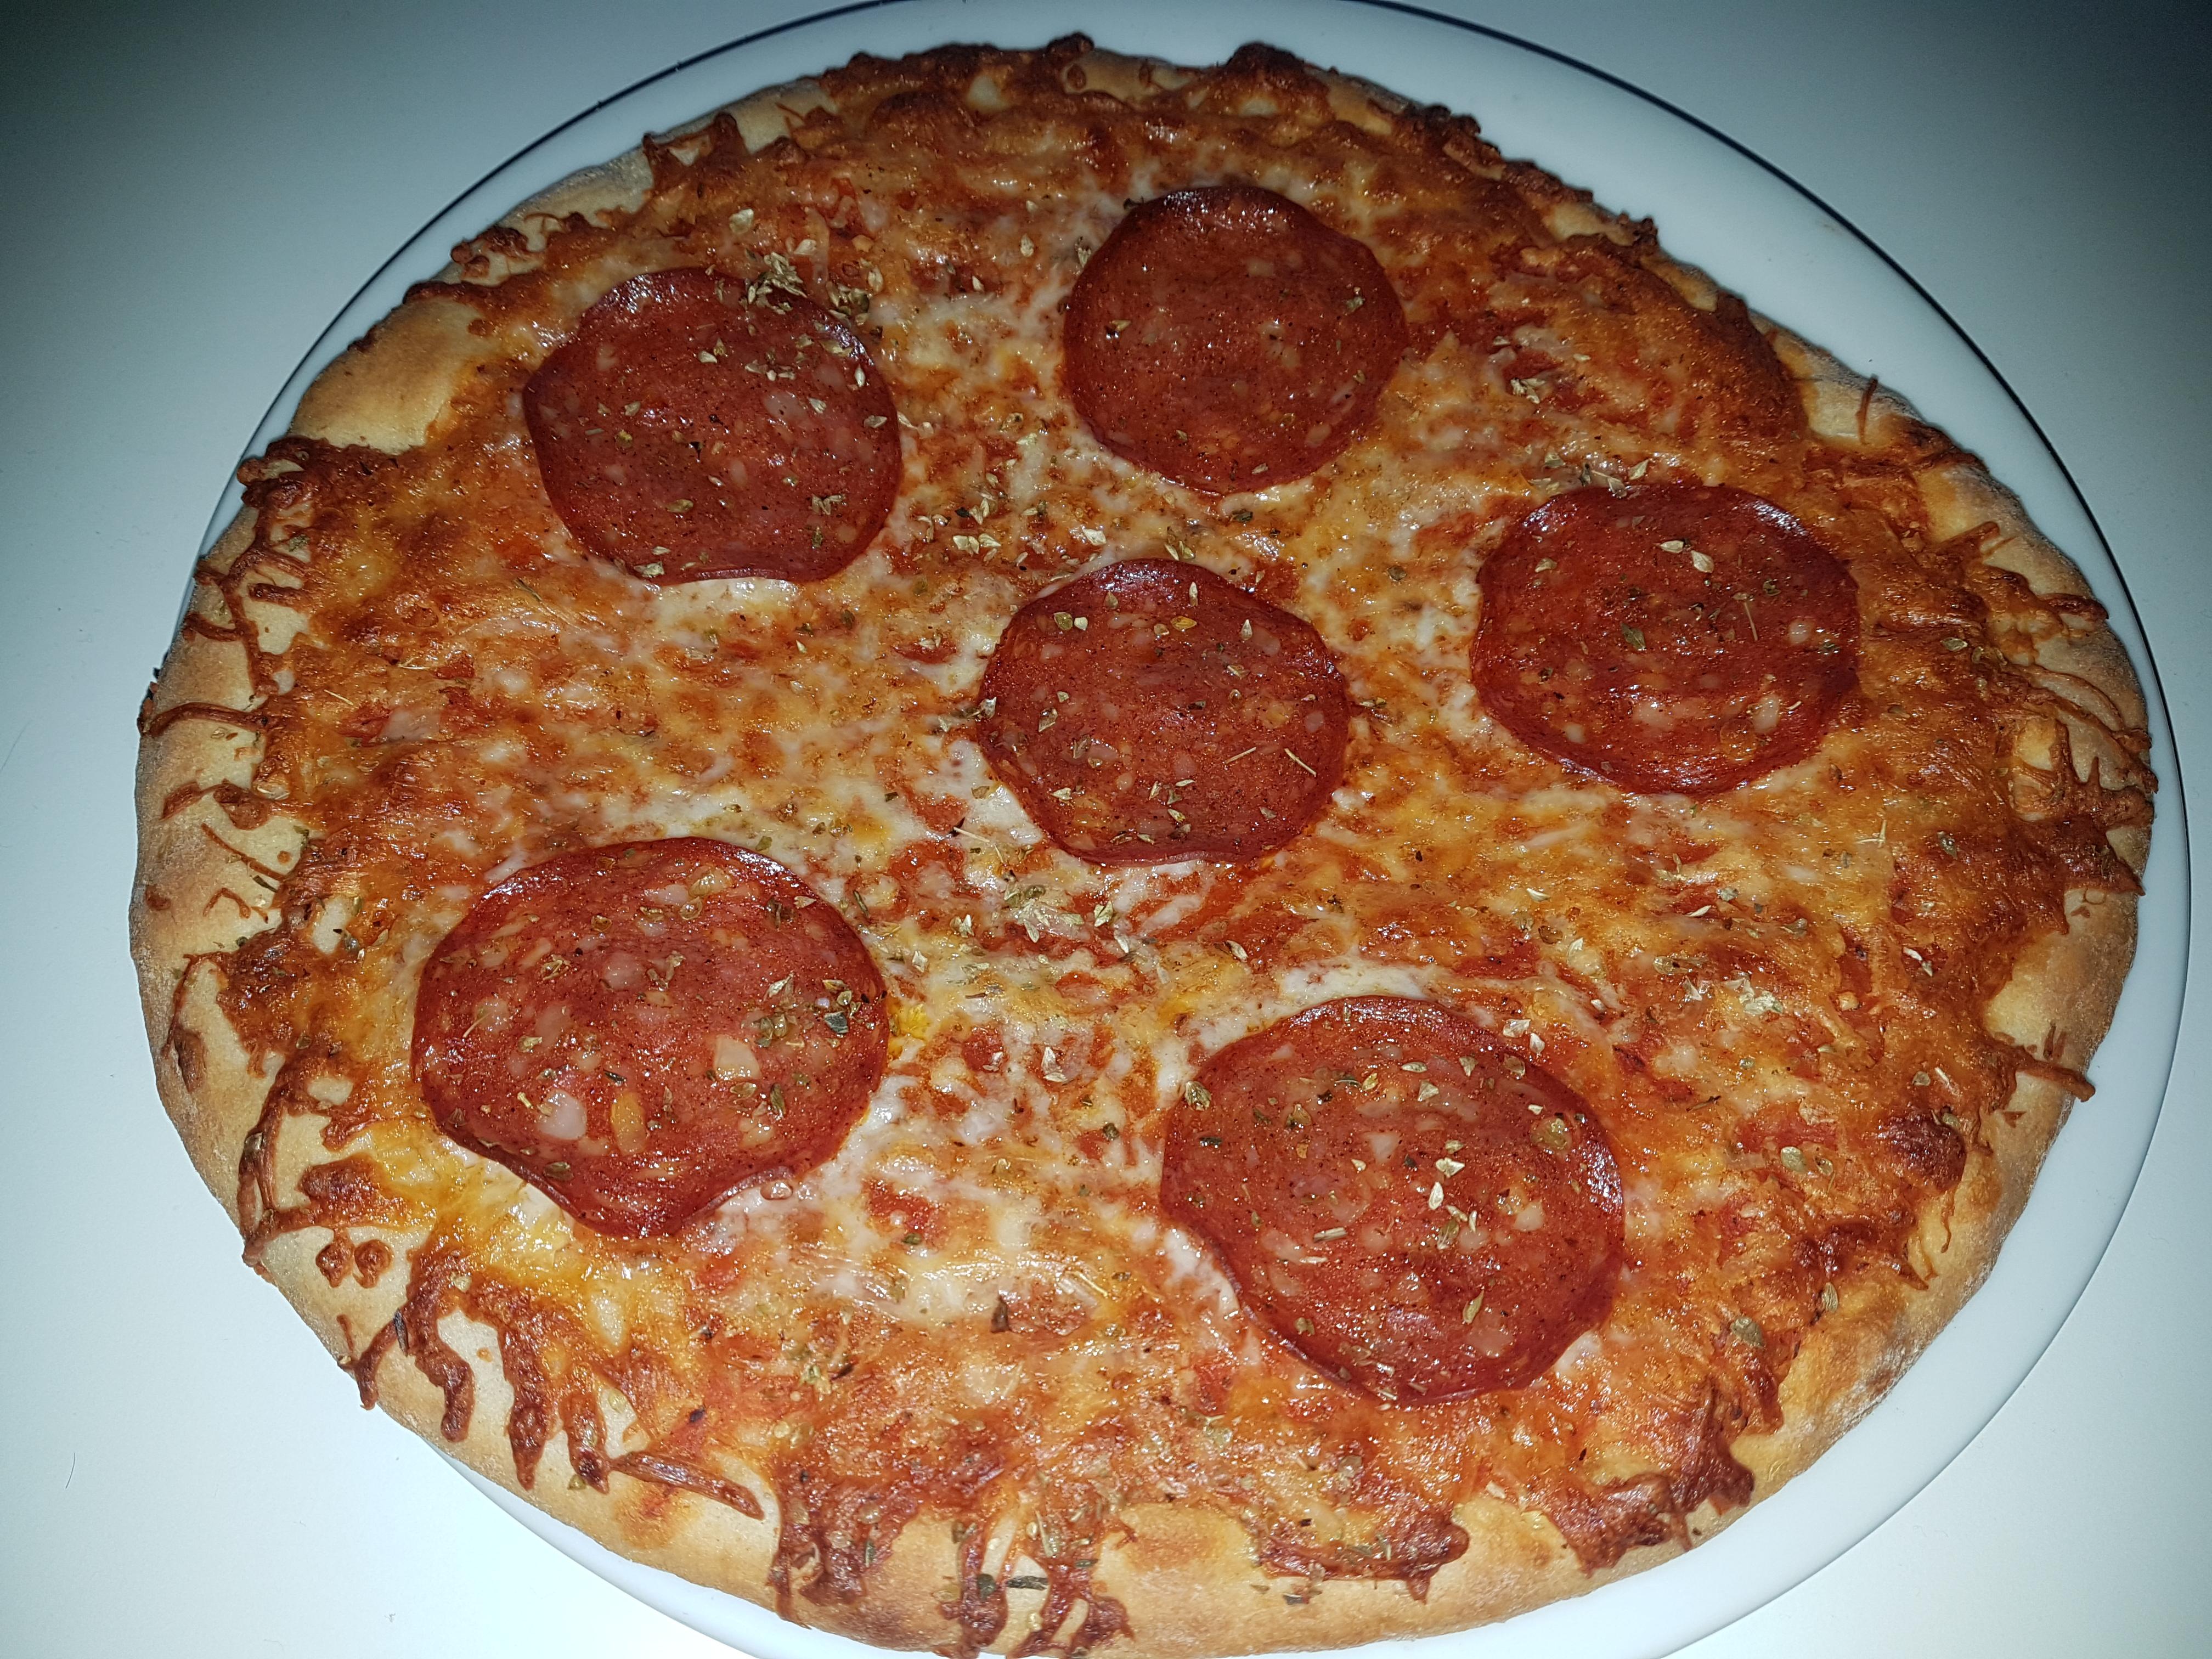 http://foodloader.net/Holz_2018-10-27_Pizza.jpg